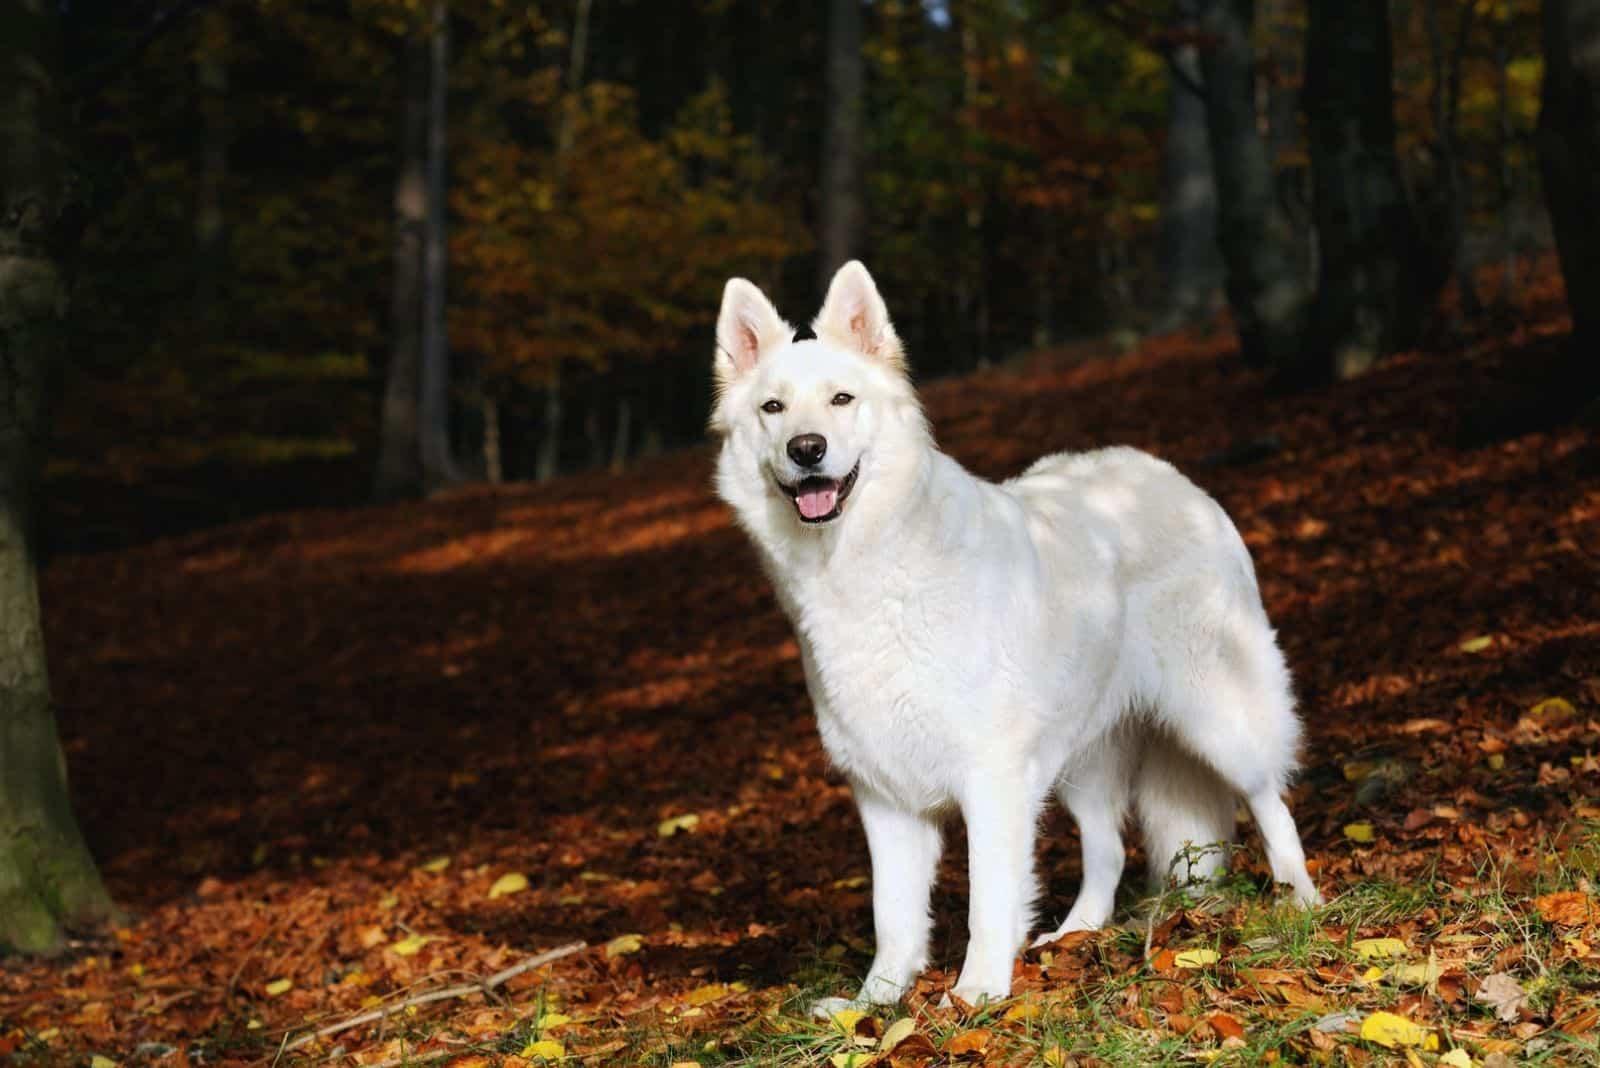 white german shepherd dog standing among autumn leaves